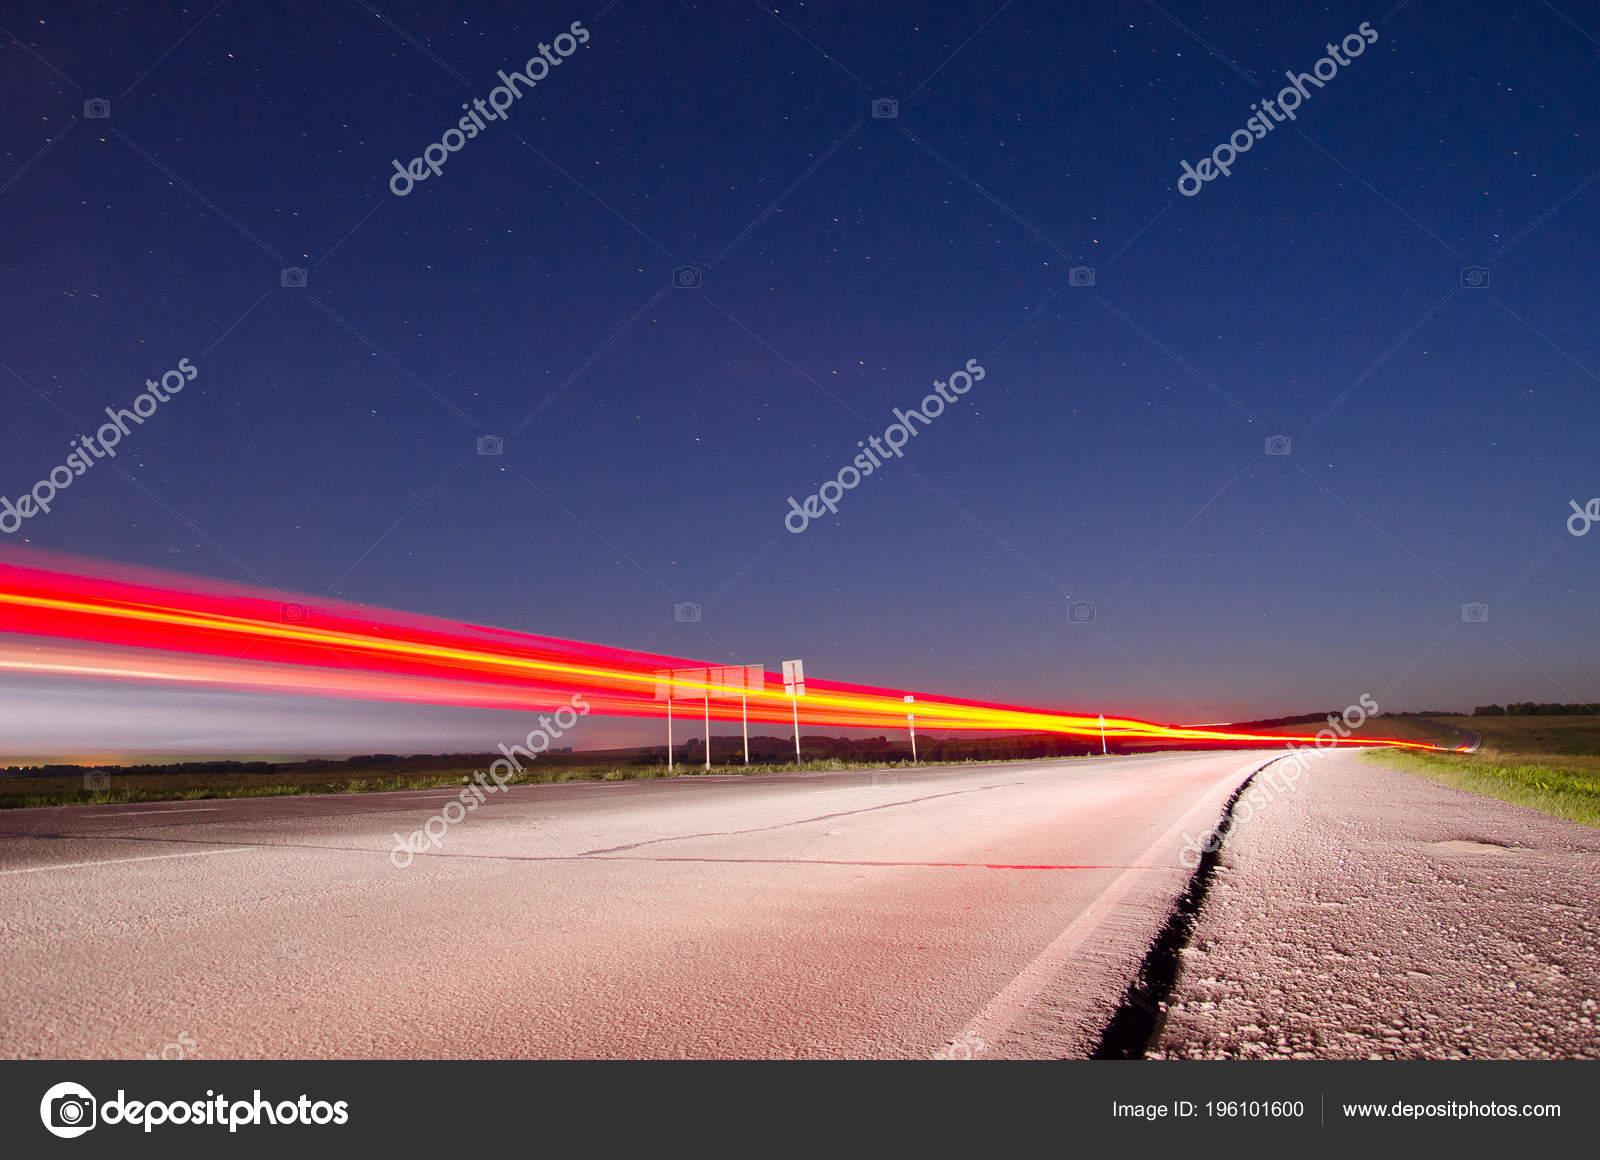 Asphalt Road Countryside Night Light Passing Speed Cars Long Exposure Stock Photo C Vox19 196101600